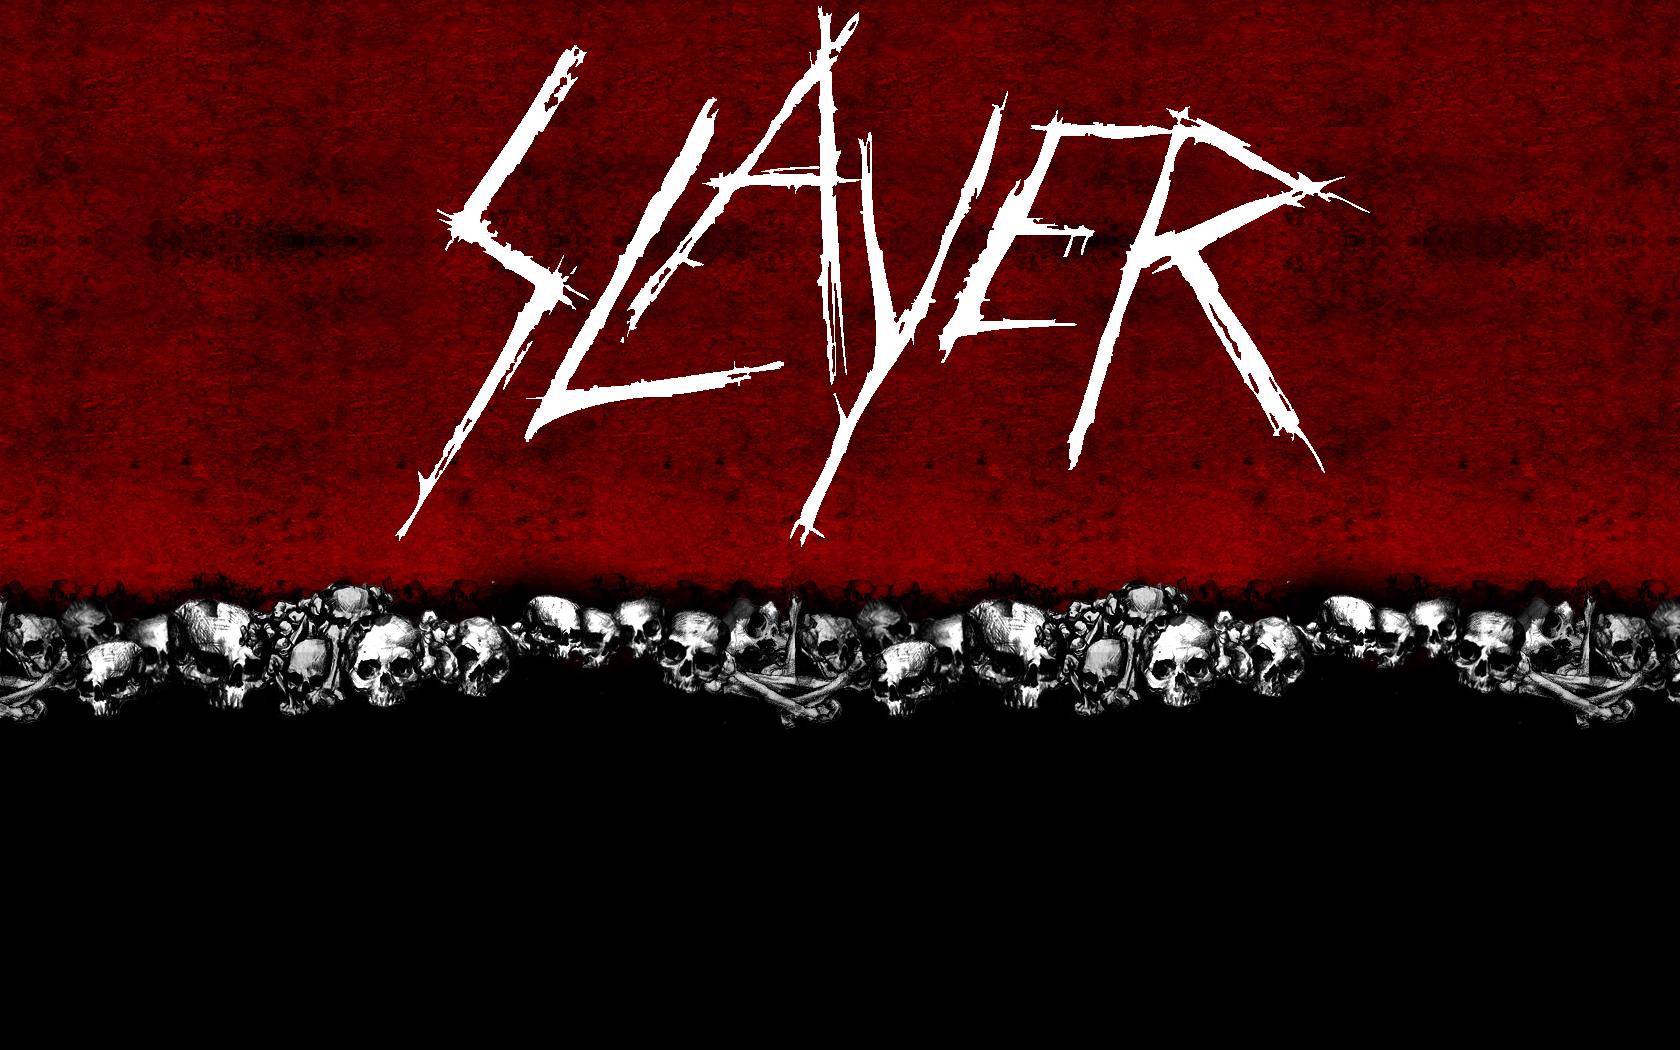 Slayer album covers wallpaper for Cover wallpaper